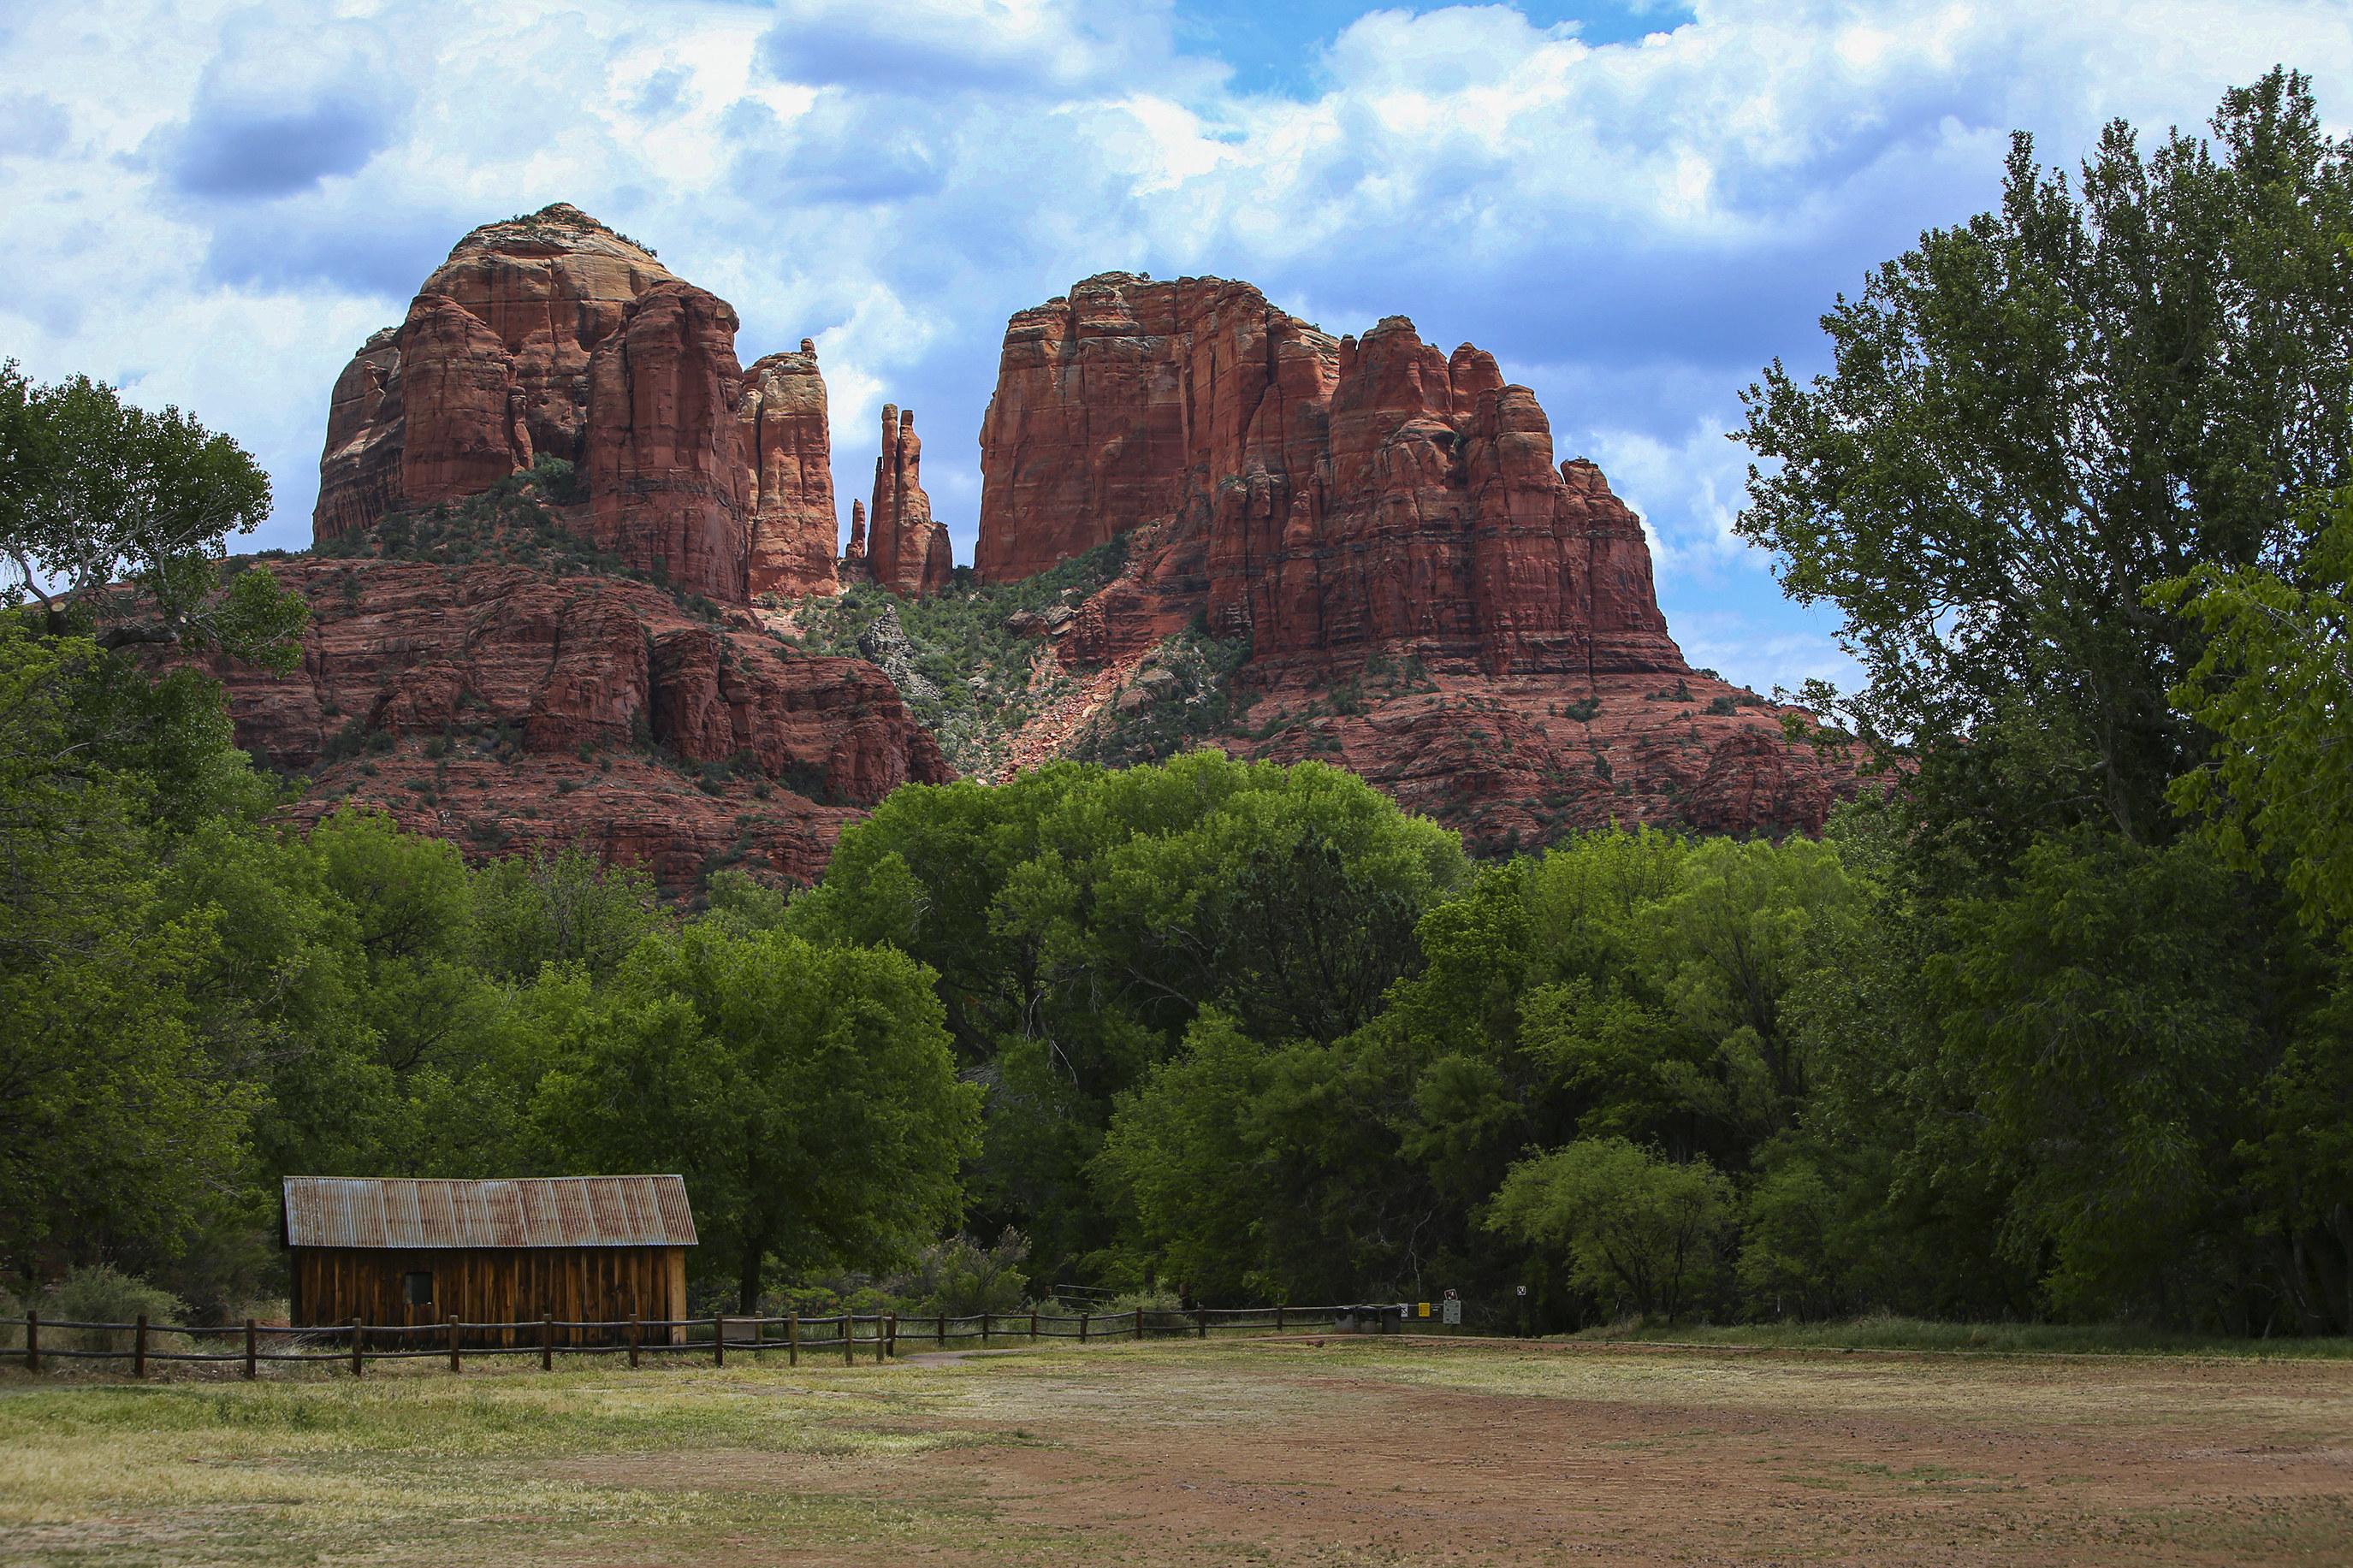 Rocks in Sedona, Arizona